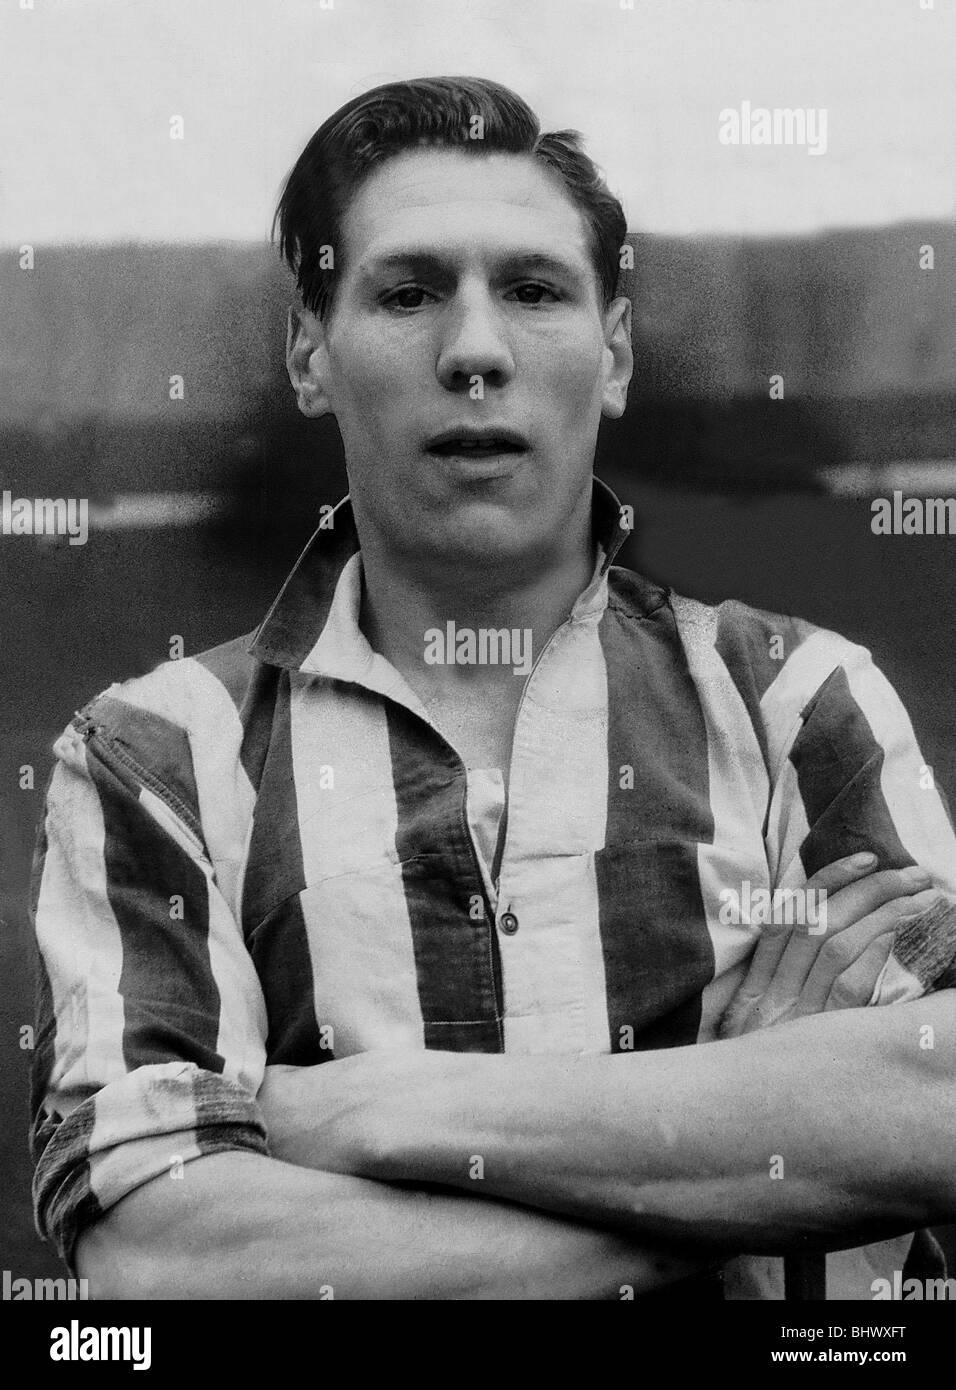 Sunderland and England footballer Len Shackleton 1946 Len Shackleton was one of the most talented footballers of - Stock Image